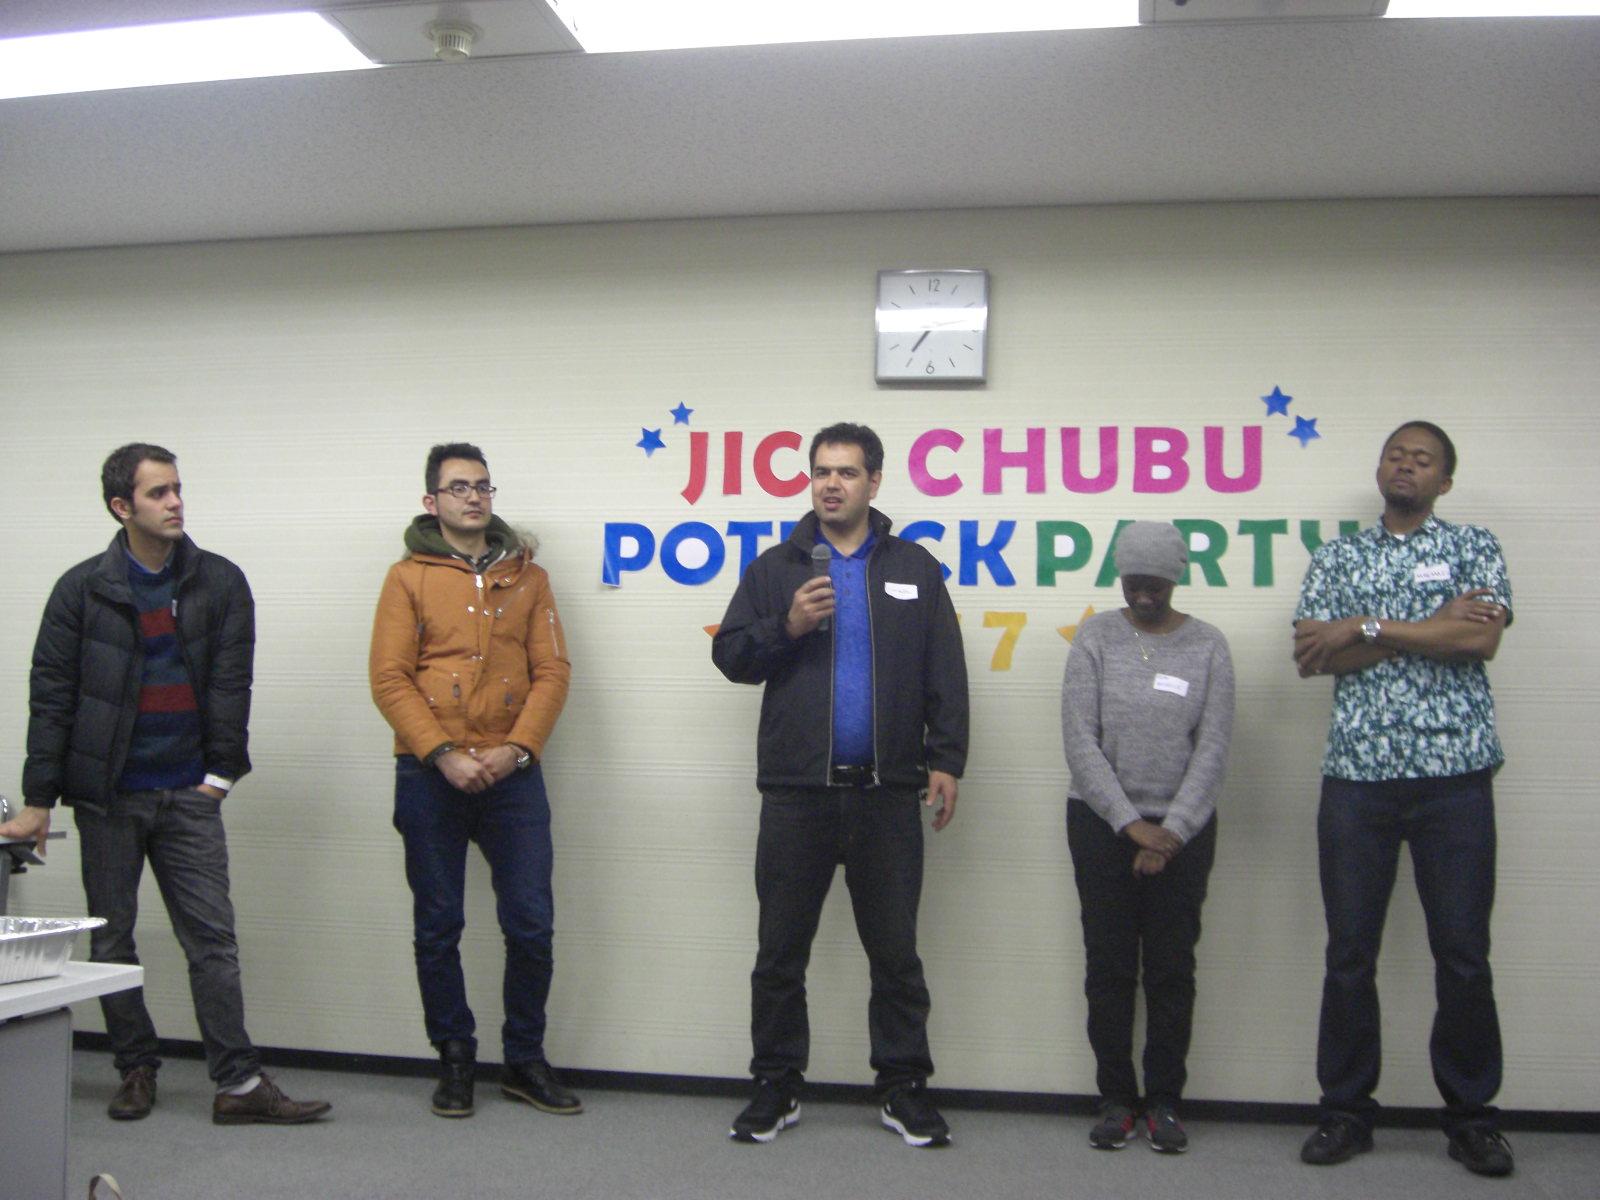 chubu_potluck2017_6.JPG